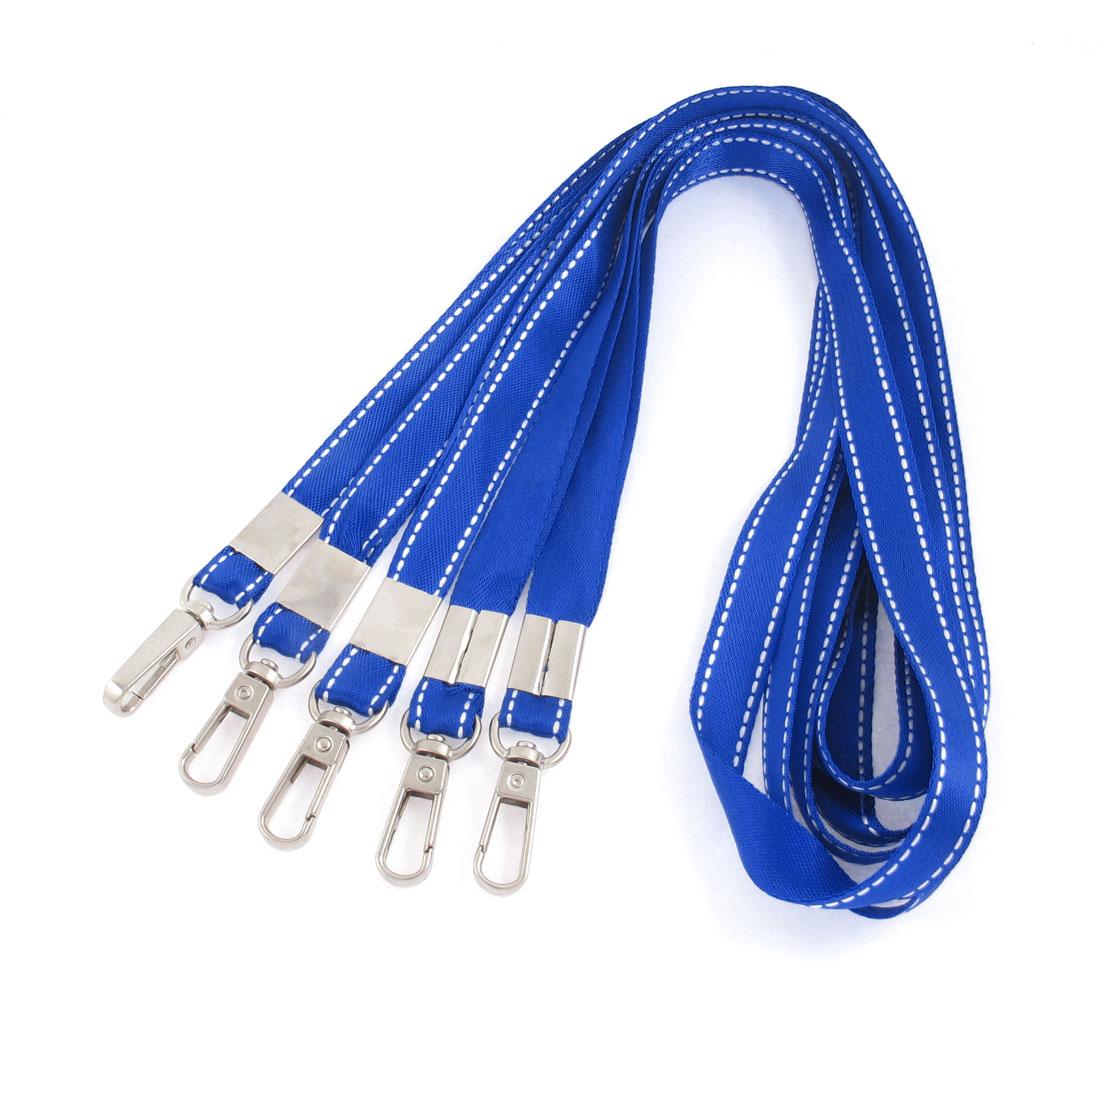 Work Card USB Keys Phone Holder Keychain Cord Lanyard Neck Strap Royal Blue 5pcs